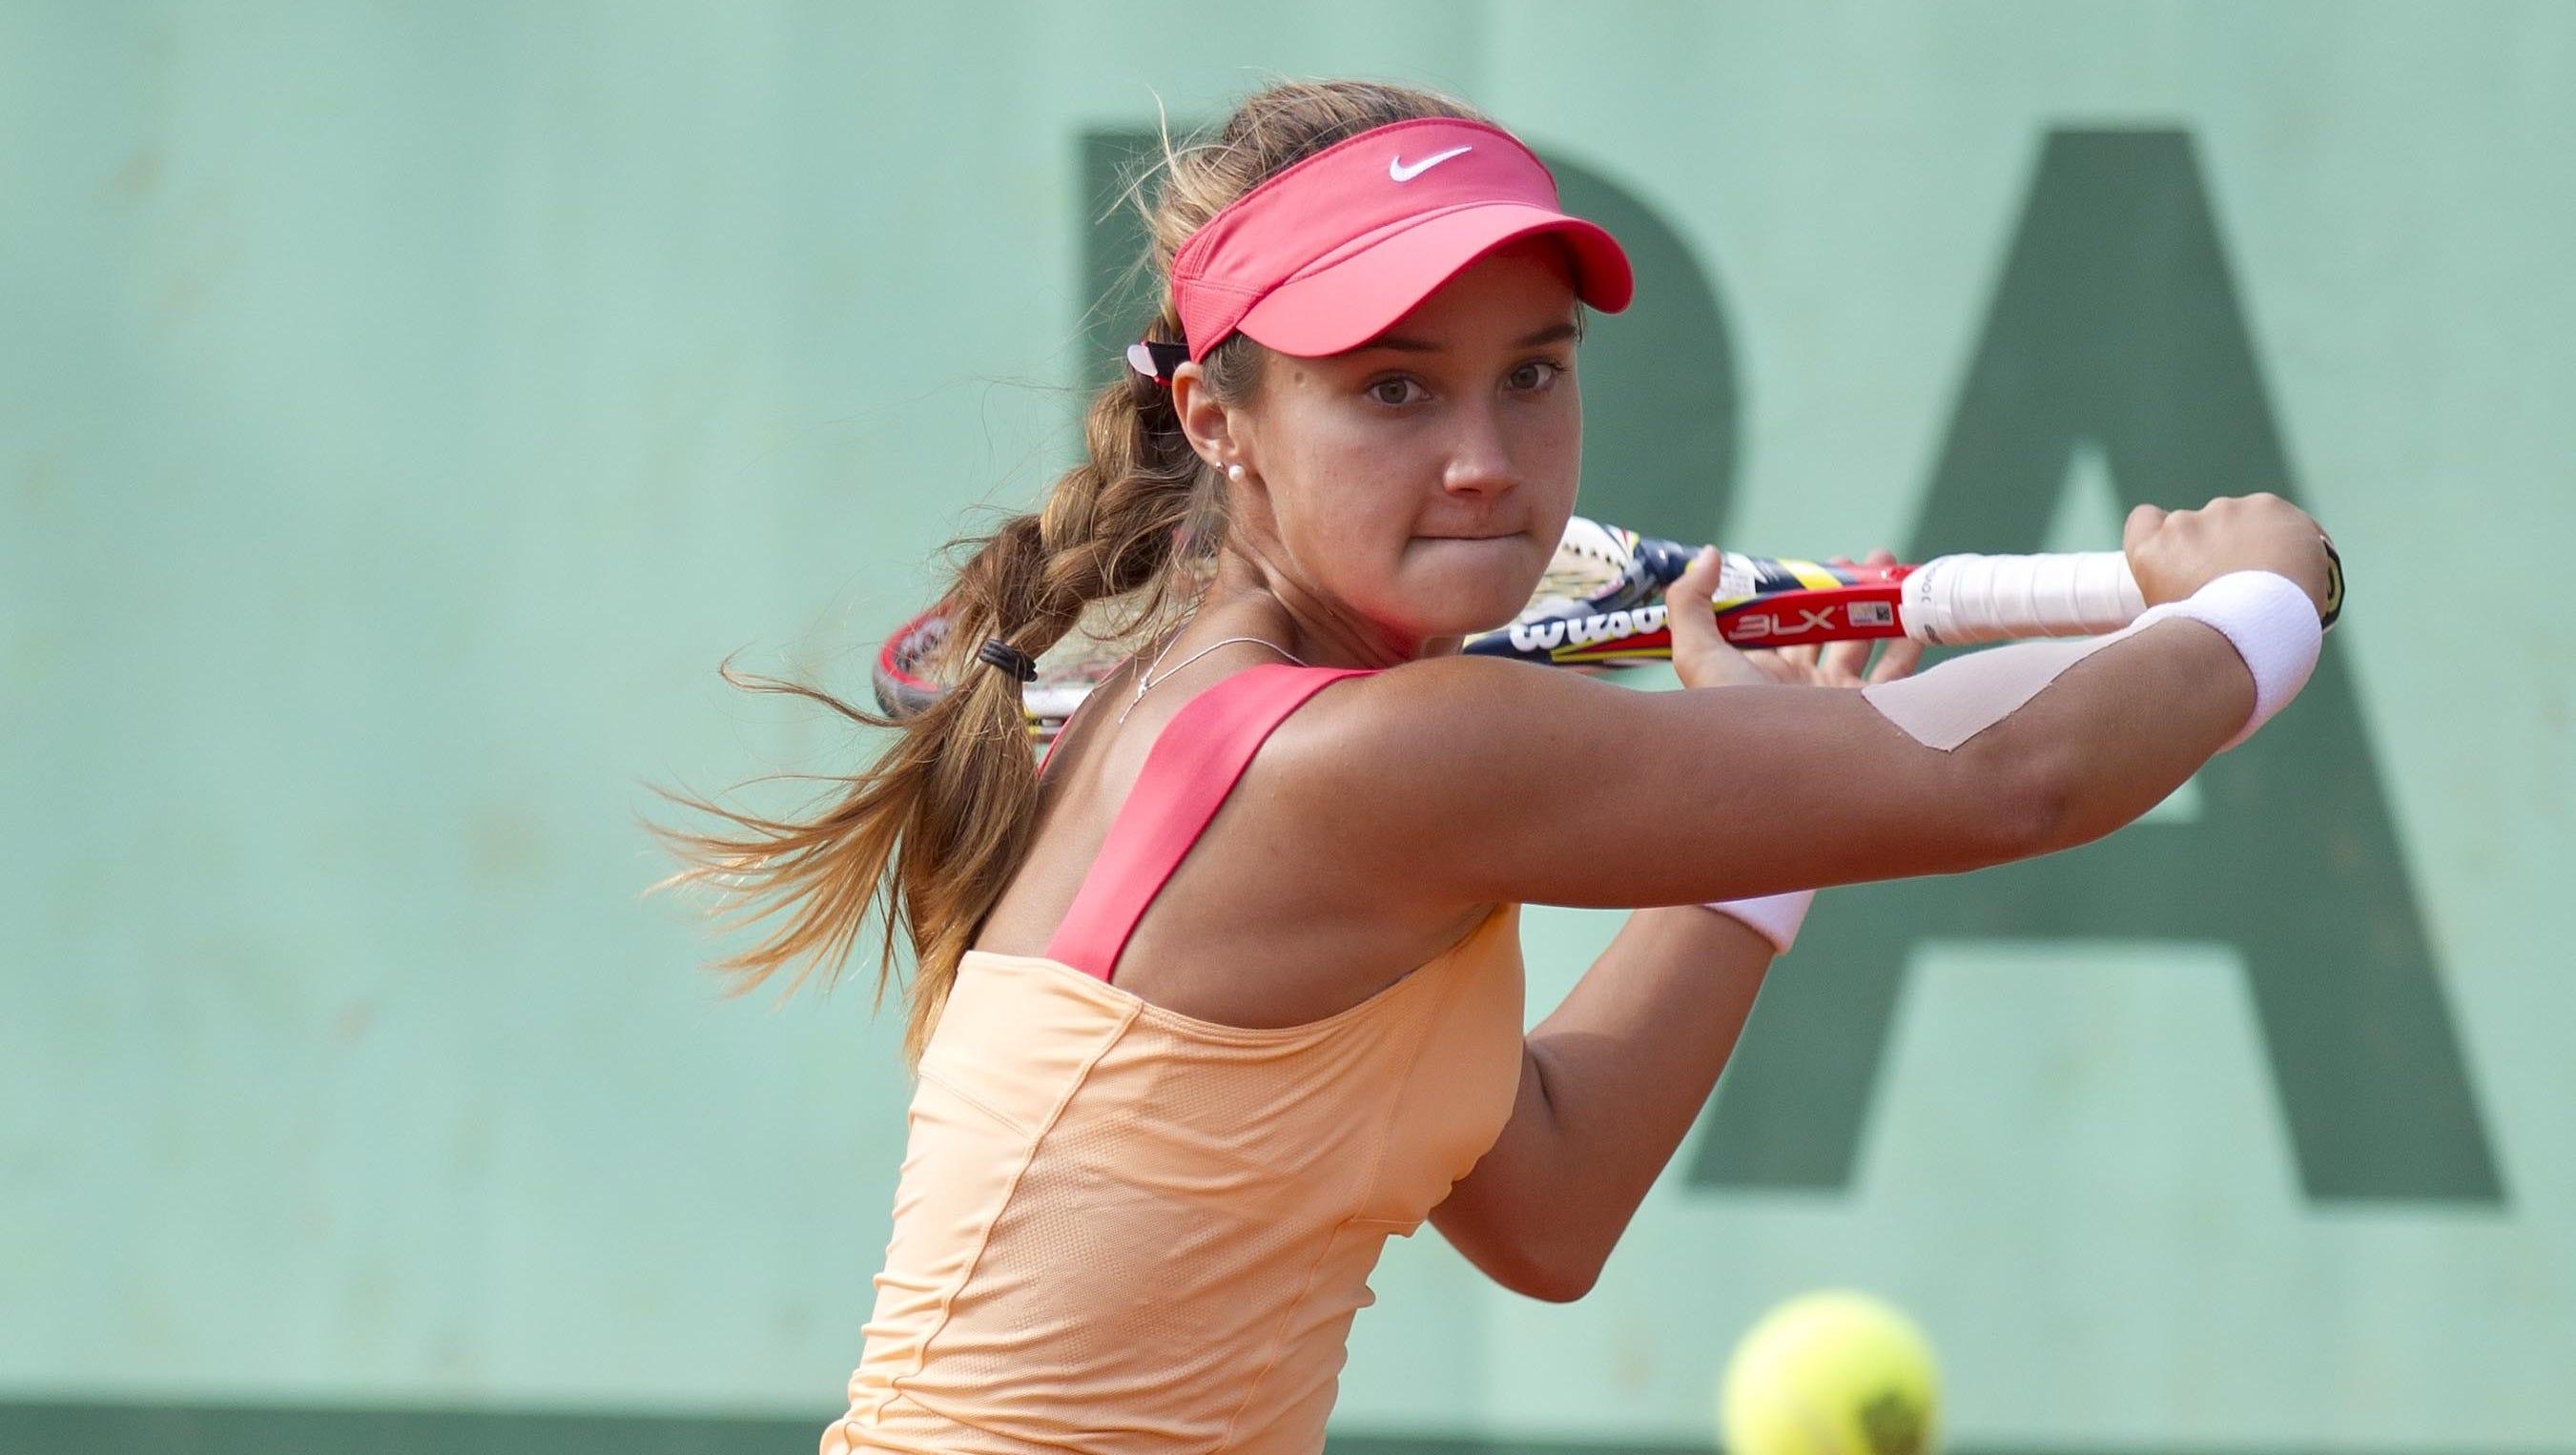 usp tennis  french open mchale vs davis 16 9 jpg?width=2701&height=1526&fit=crop&format=pjpg&auto=webp.